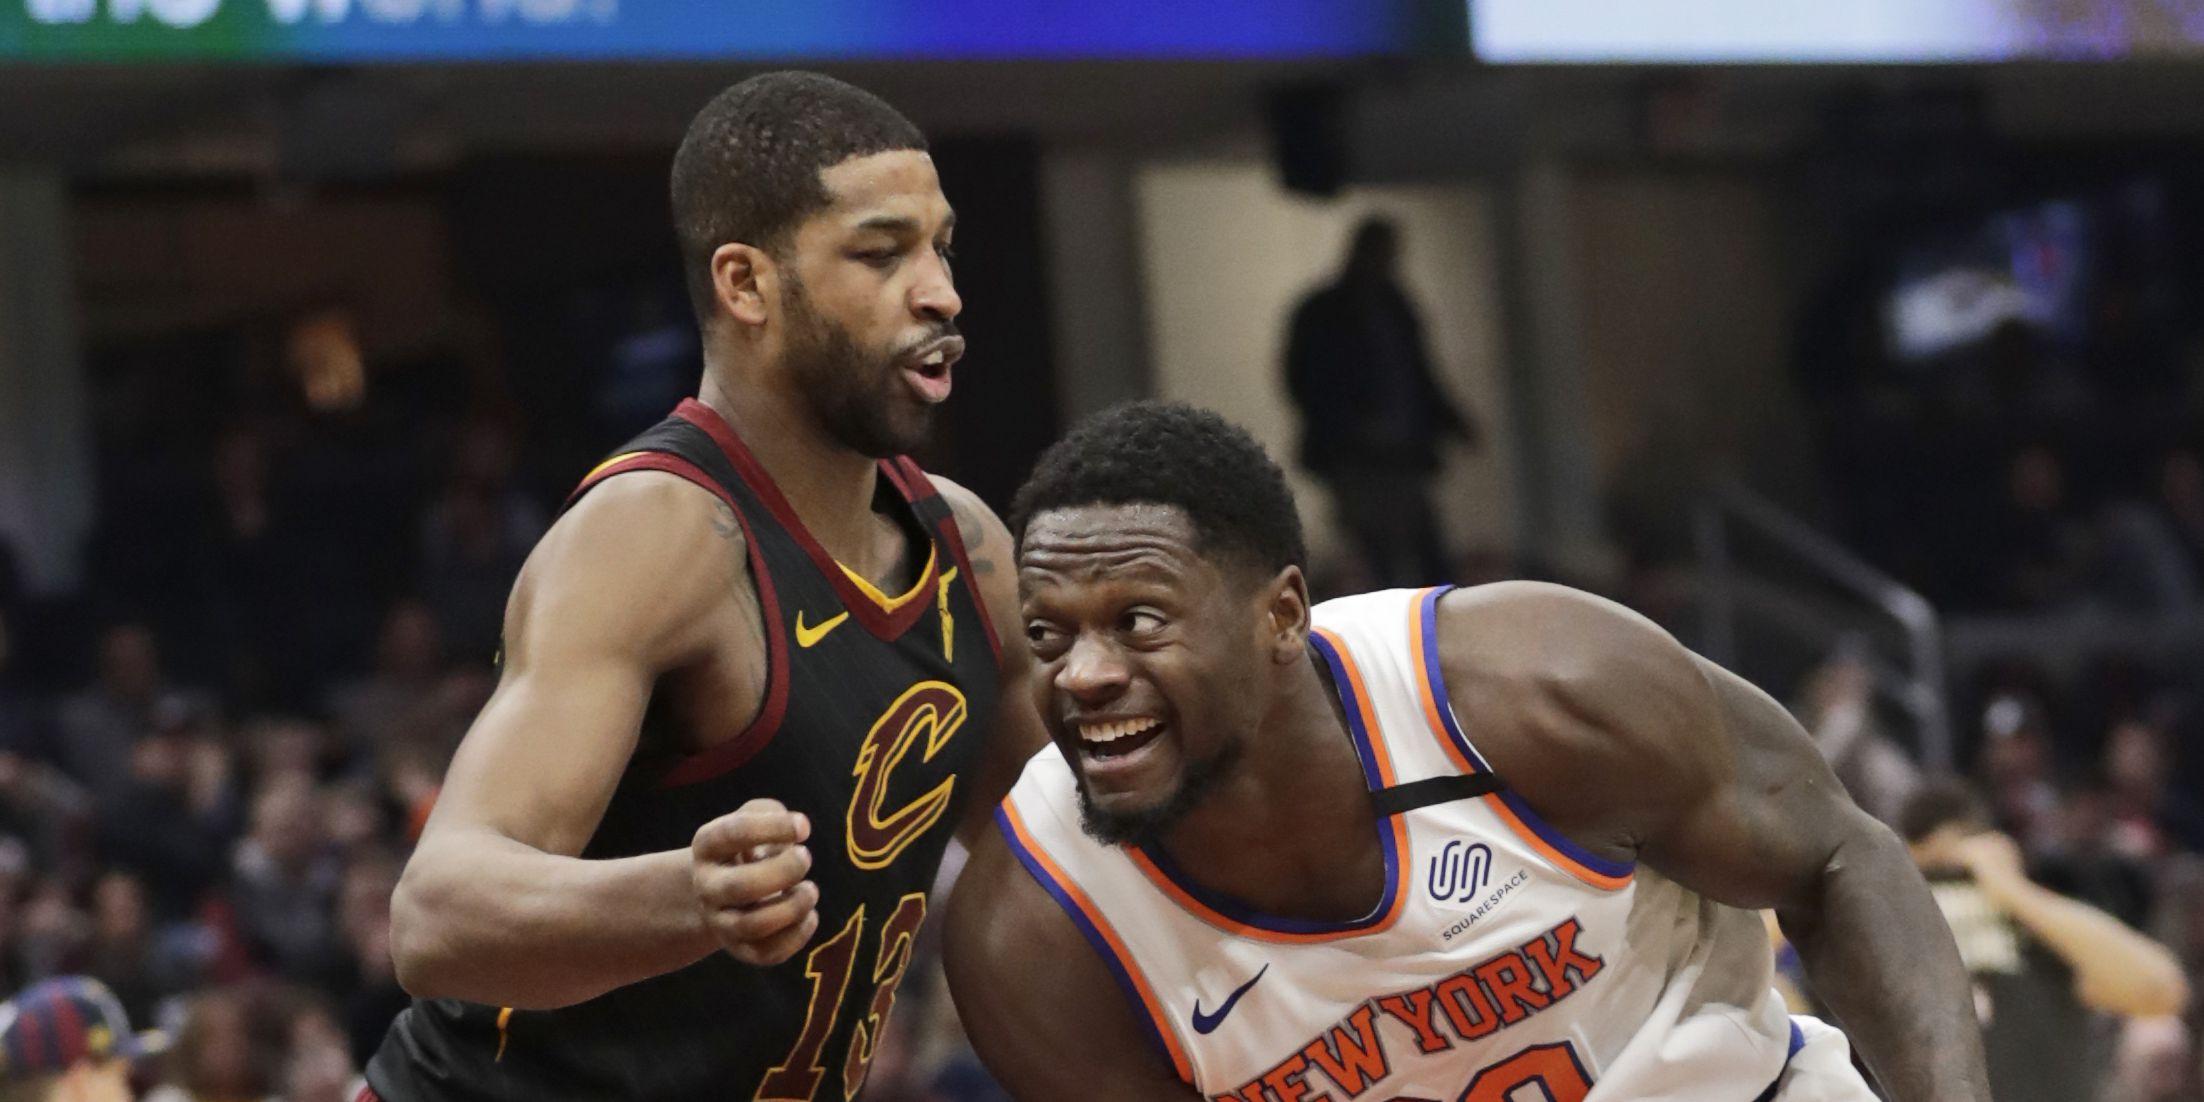 Morris, Randle lead Knicks past Cavs 106-86